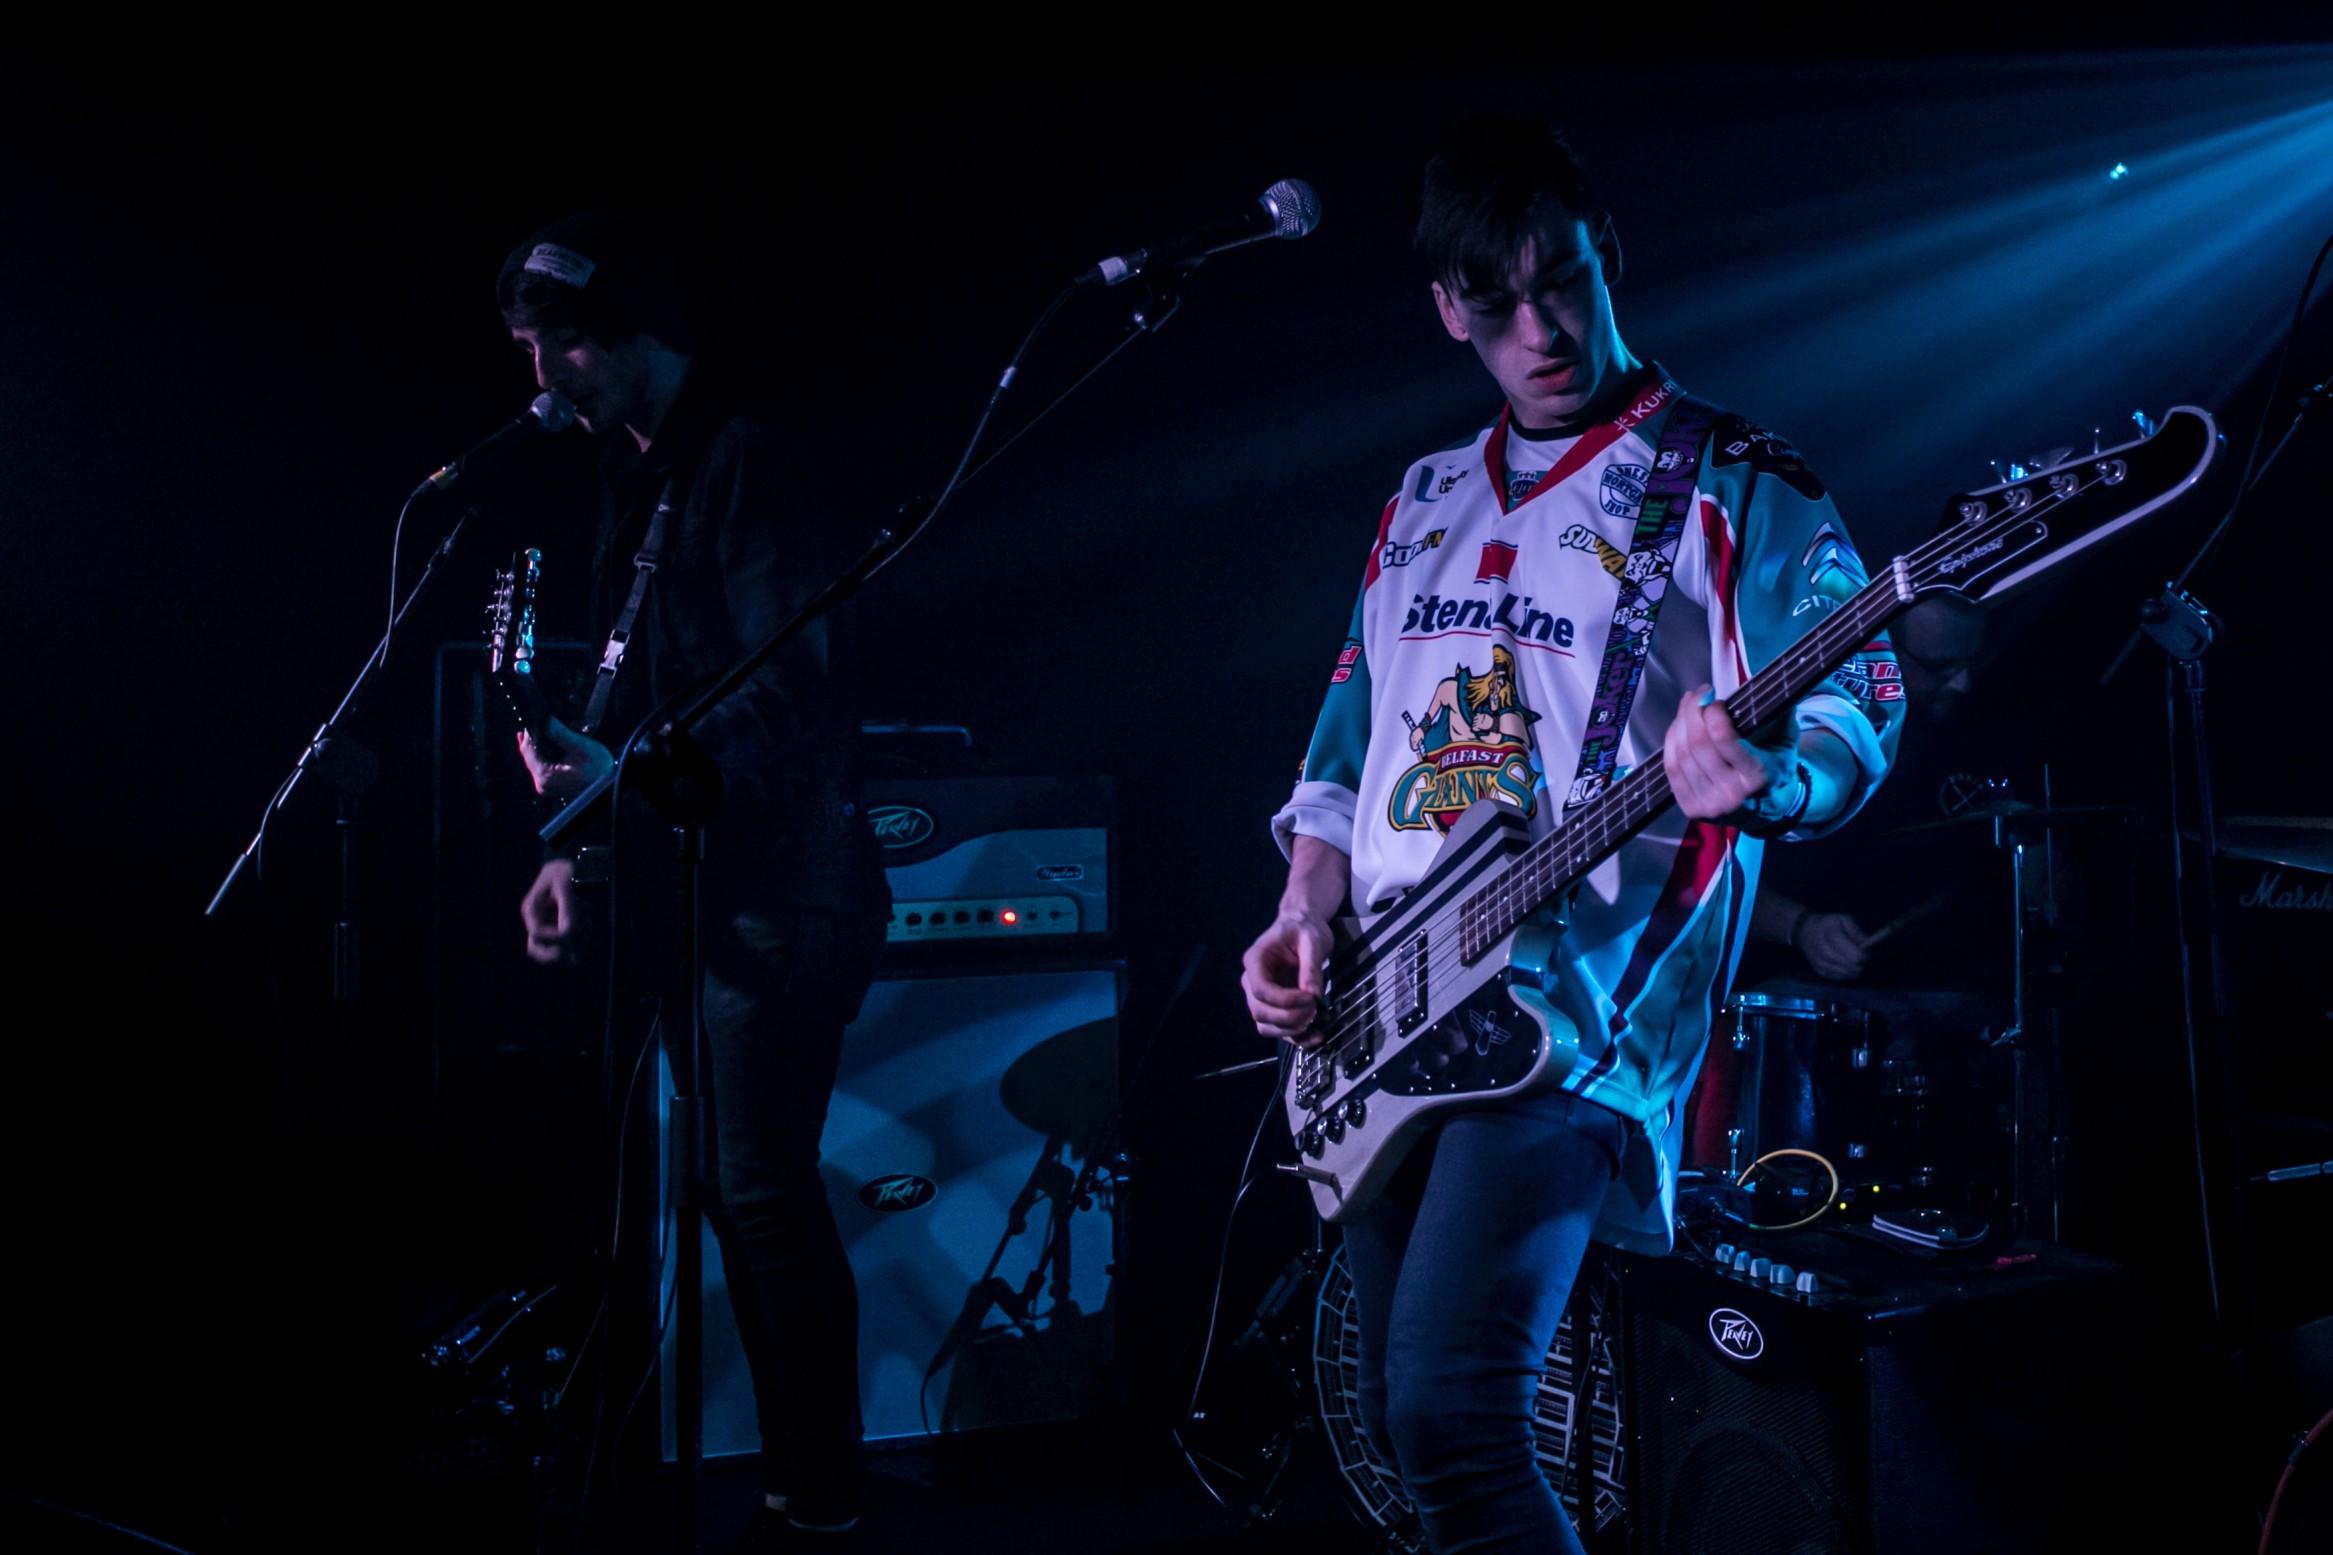 The Sherlocks @ Voodoo Belfast 3